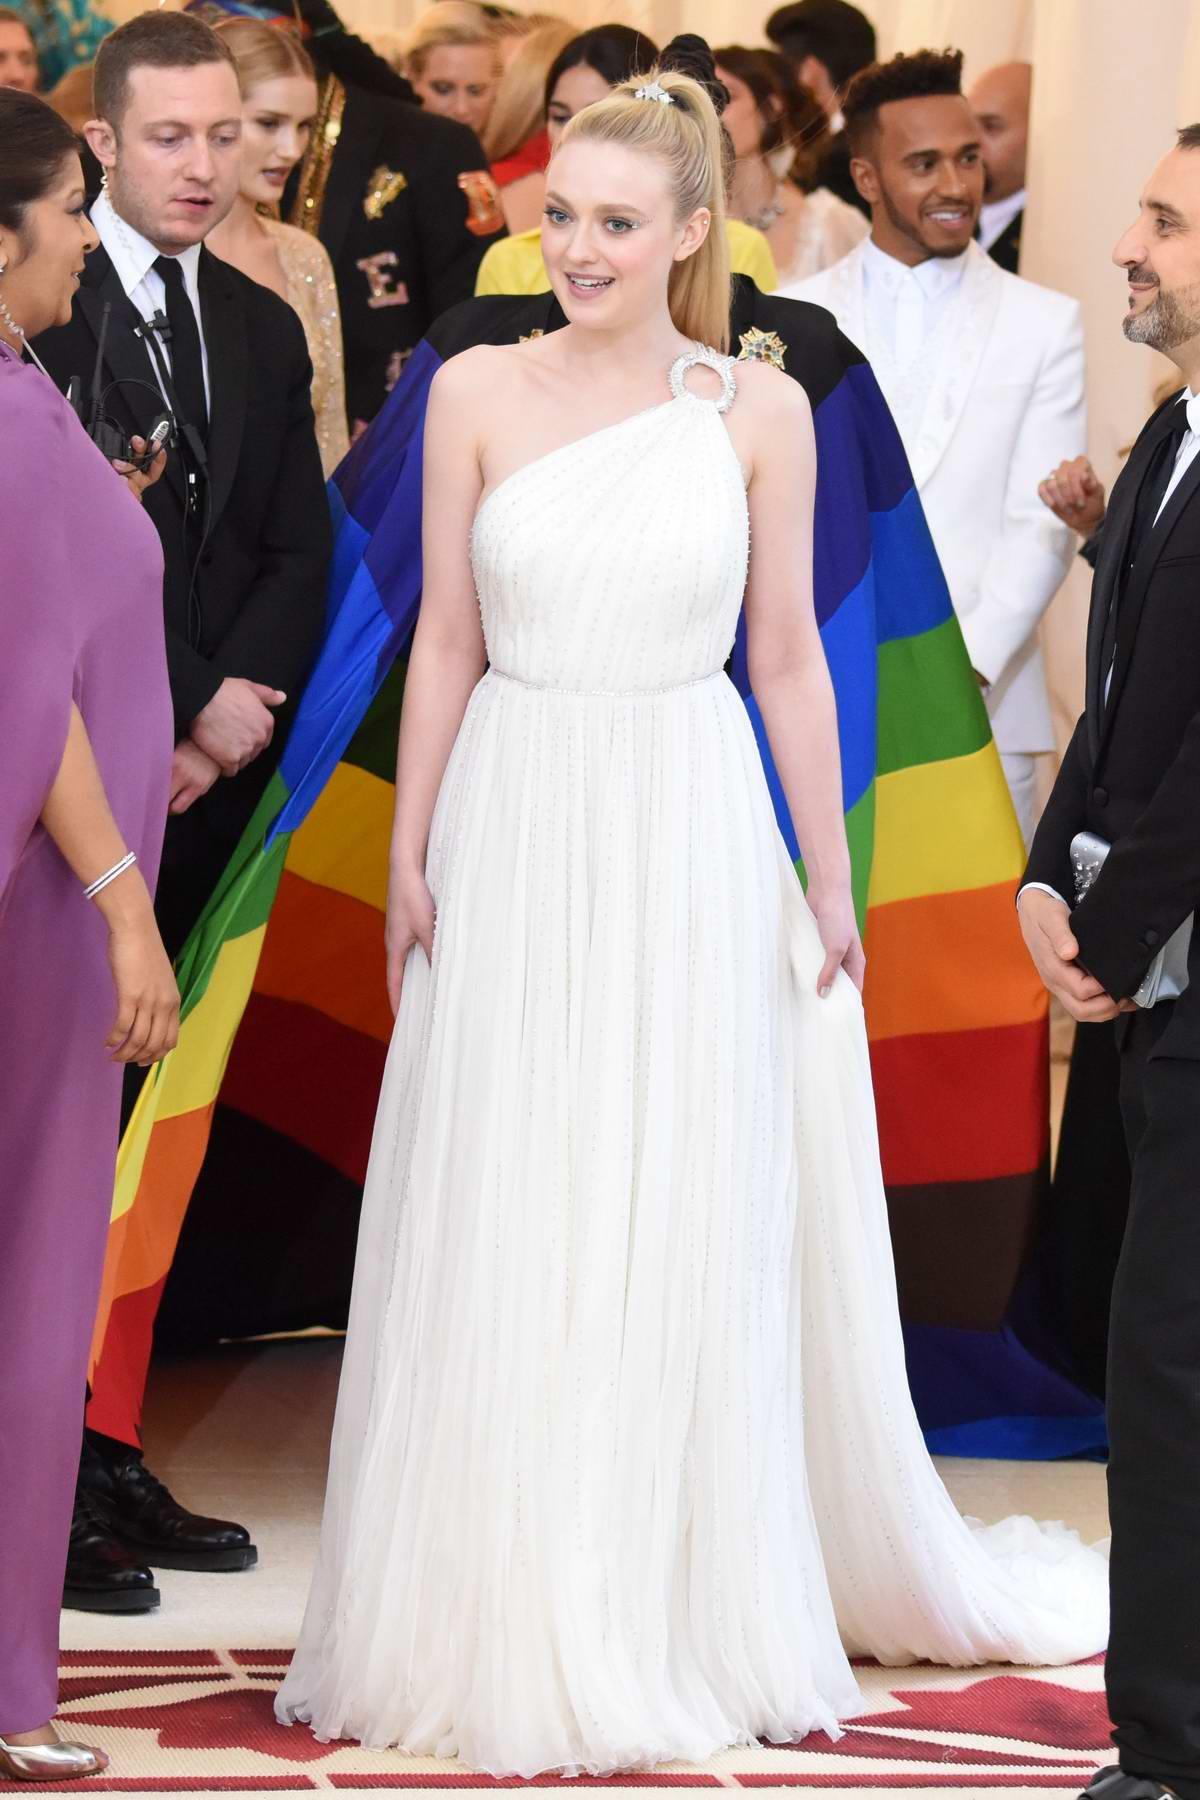 Dakota Fanning attends The Costume Institute Benefit Gala (MET Gala 2018) at Metropolitan Museum of Art in New York City